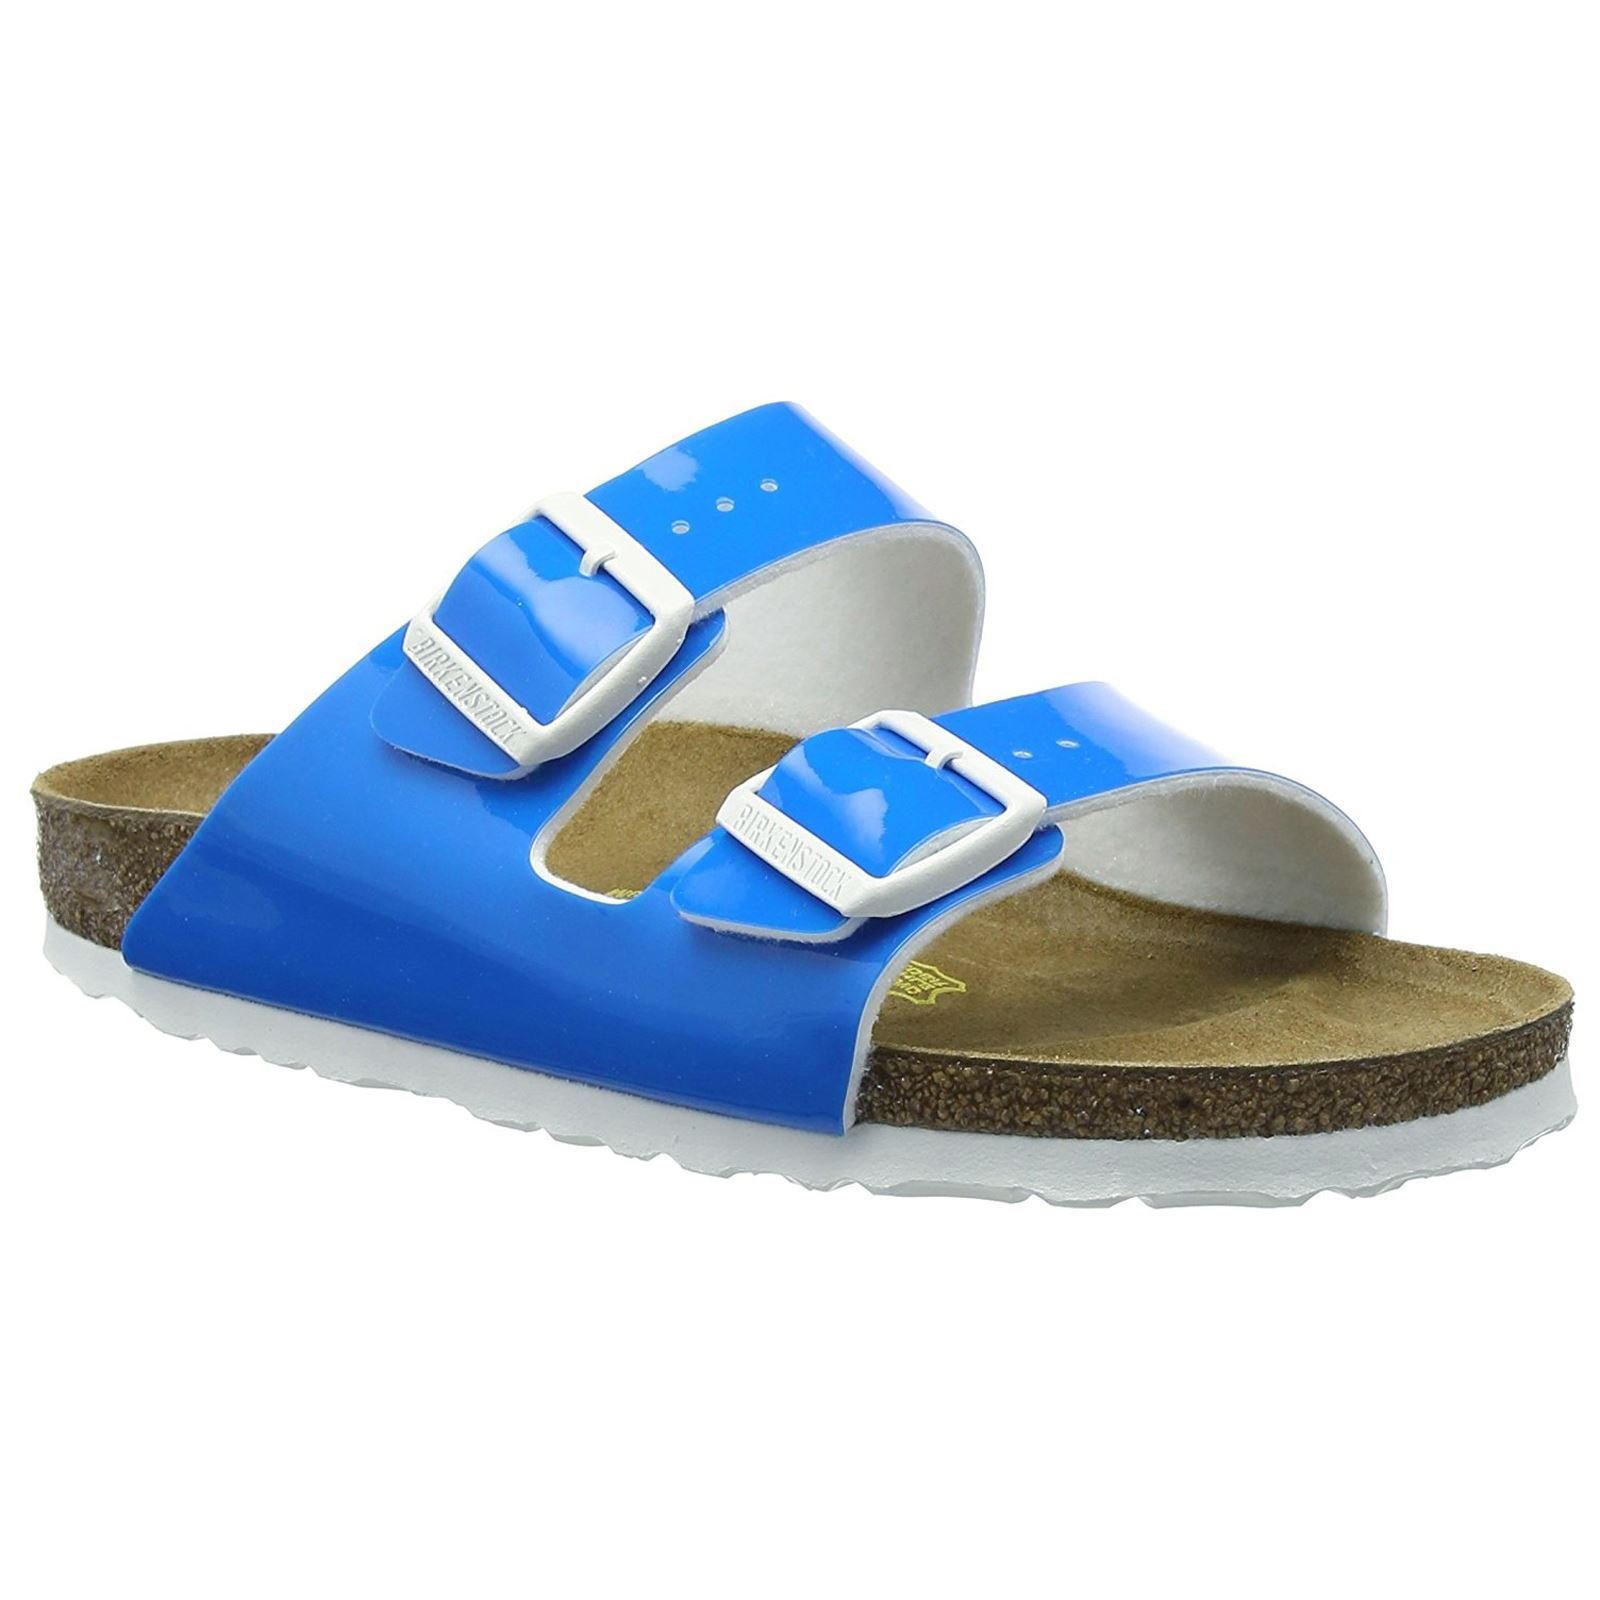 Birkenstock Women's Arizona Neon Blue Patent Birko-Flor¿ Sandal